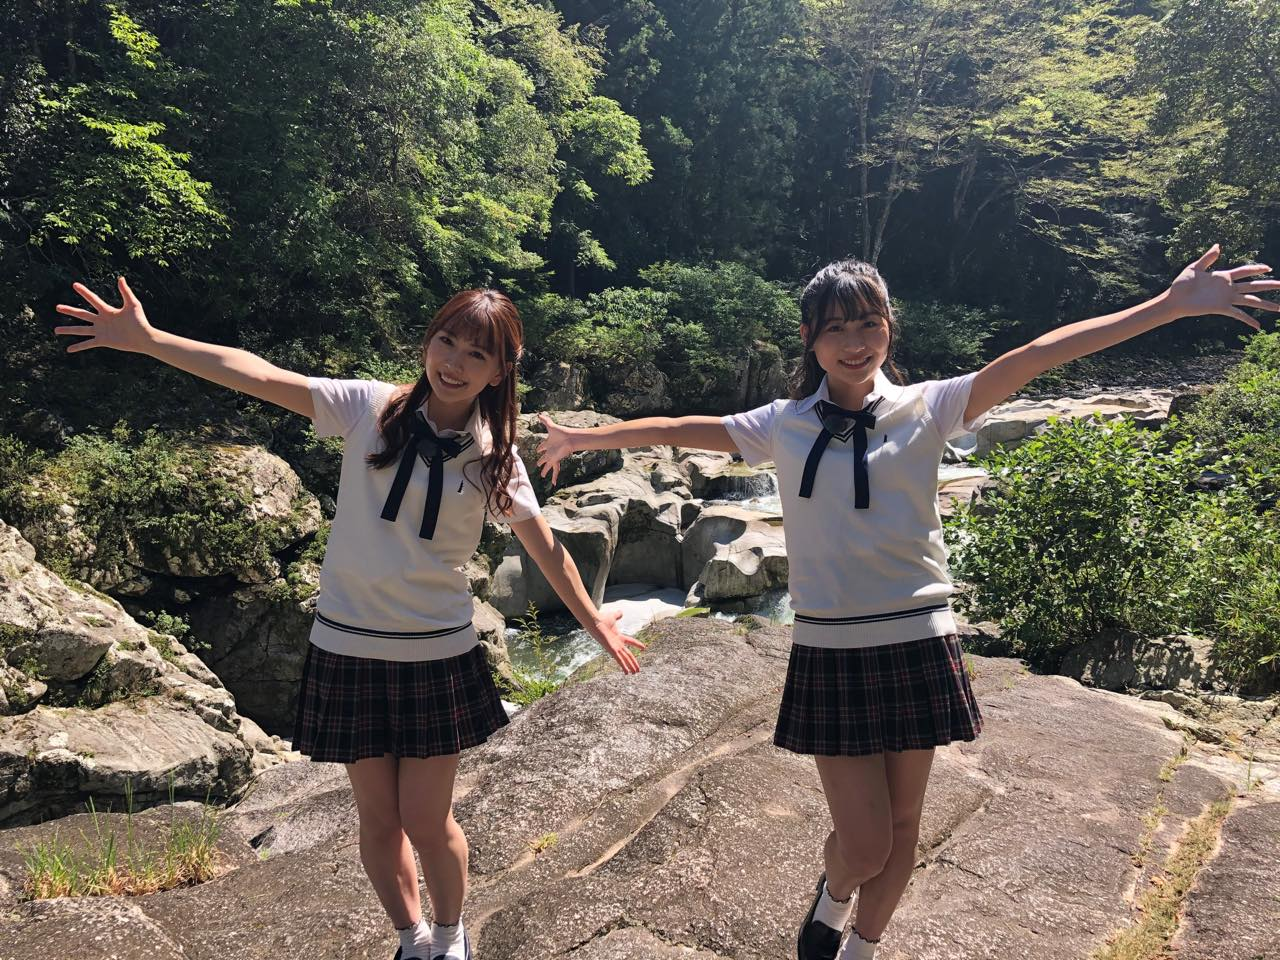 「SKE48は君と歌いたい」青海ひな乃&熊崎晴香が愛知県奥三河エリアを訪れる②【東海テレビ】